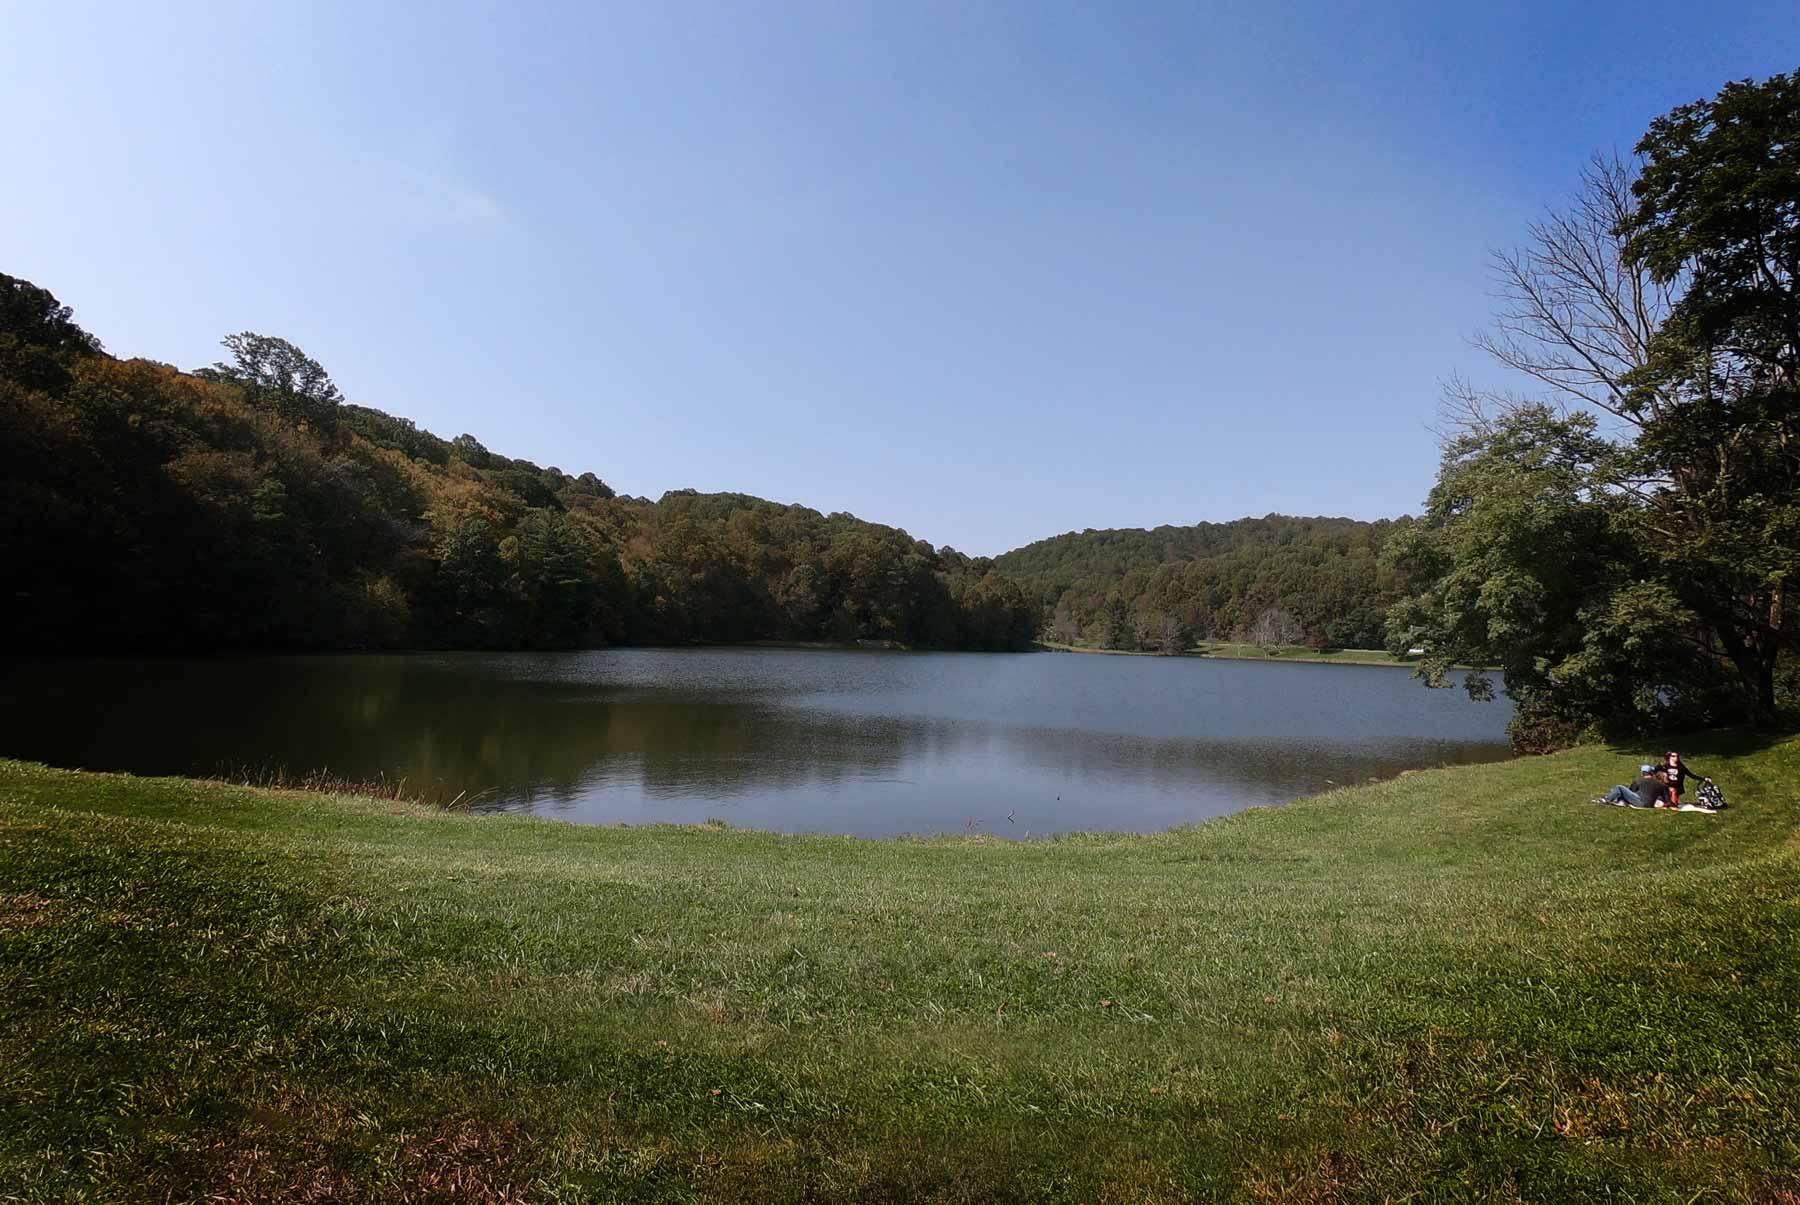 Abbott Lake at Peaks of Otter Historic Lodge off Blue Ridge Parkway, Virginia